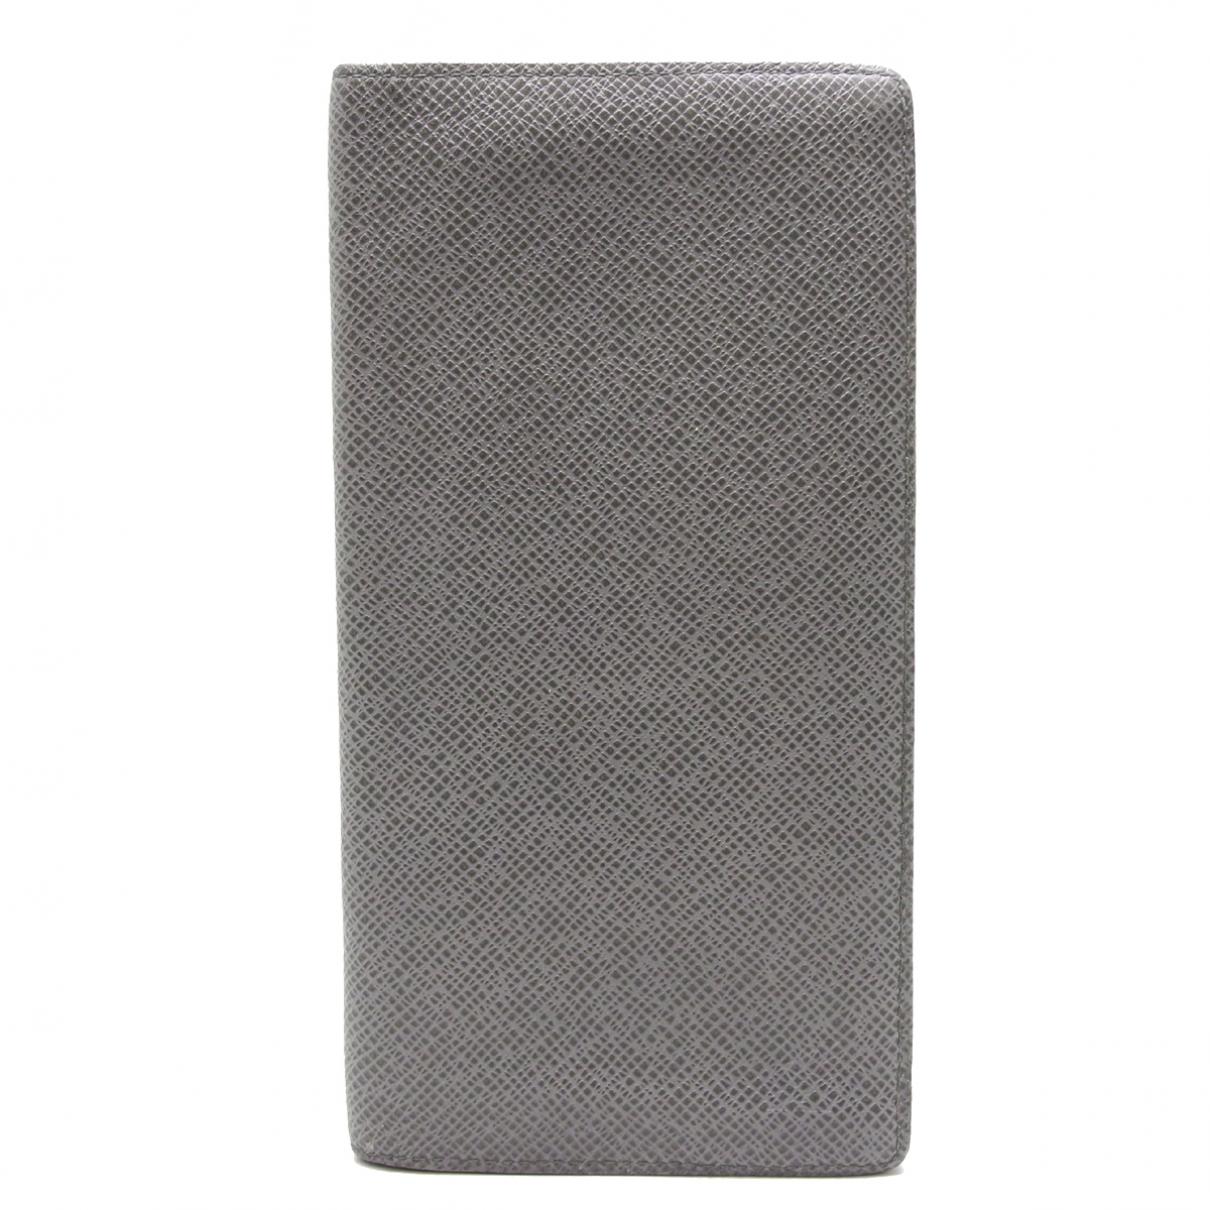 Louis Vuitton \N Cloth wallet for Women \N